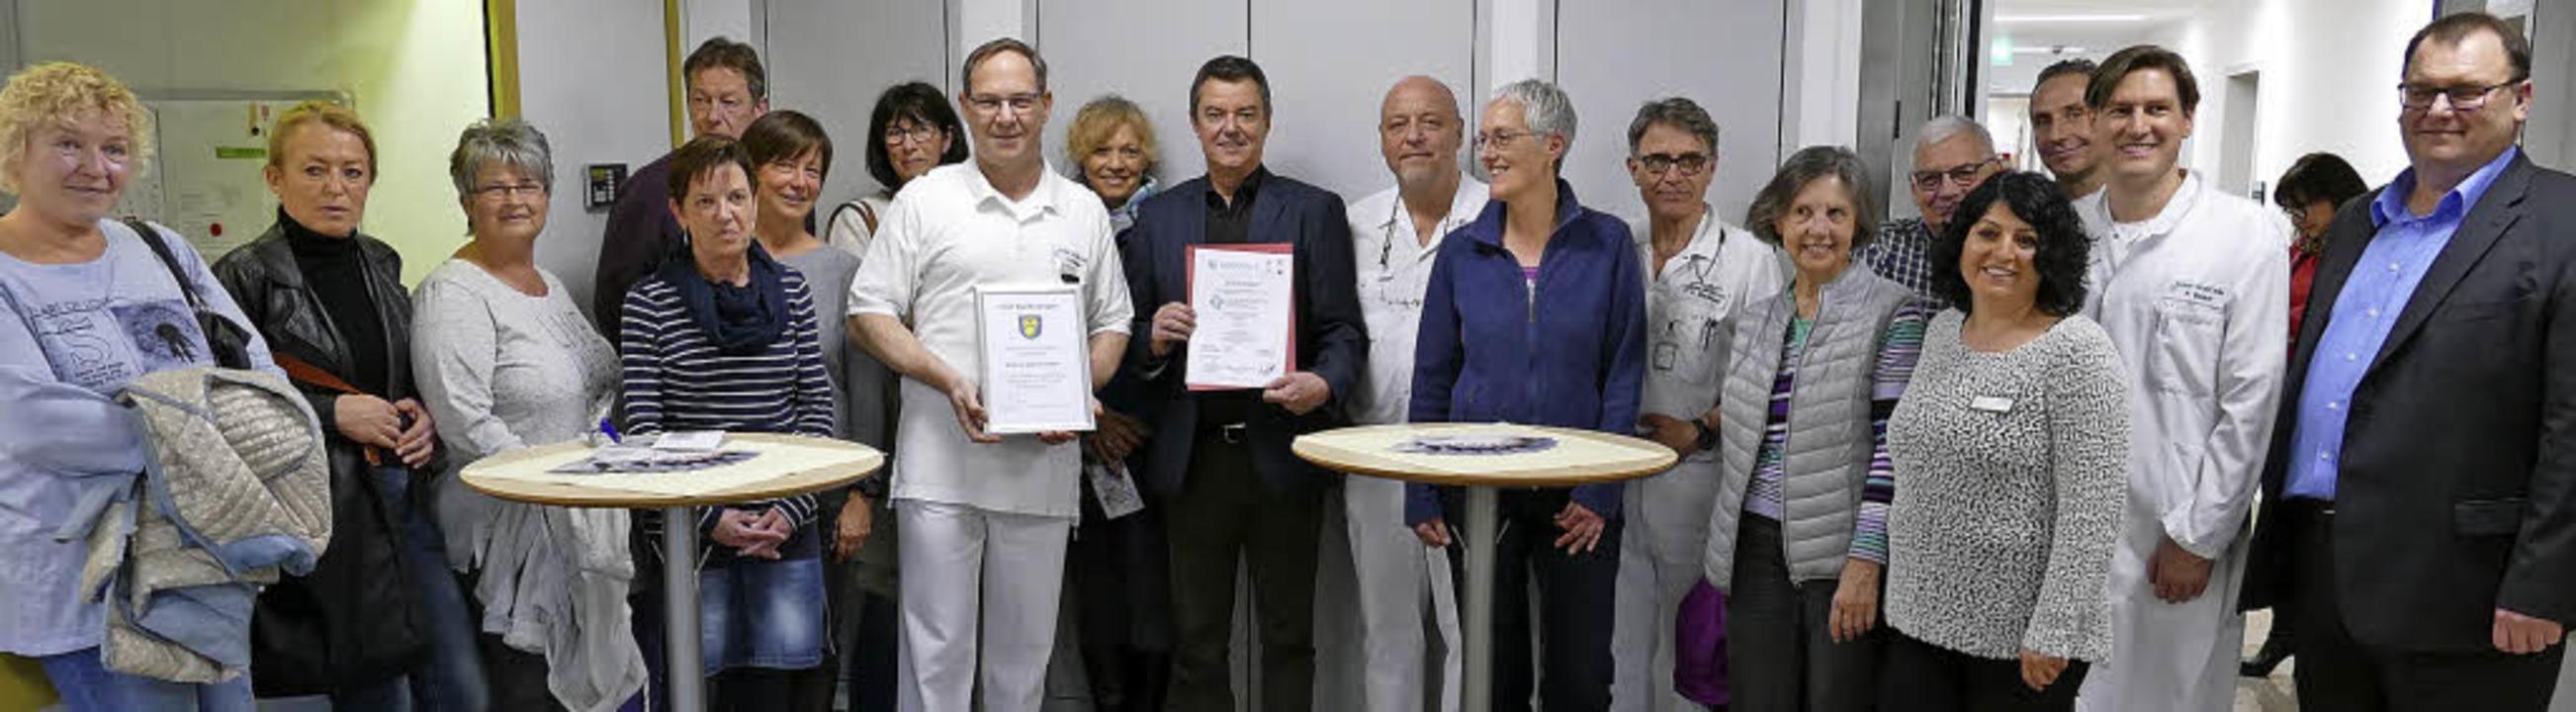 Freuen sich über die Zertifizierung: K...bandsvorsitzenden Peter Lob (rechts).   | Foto: Hans-Peter Müller